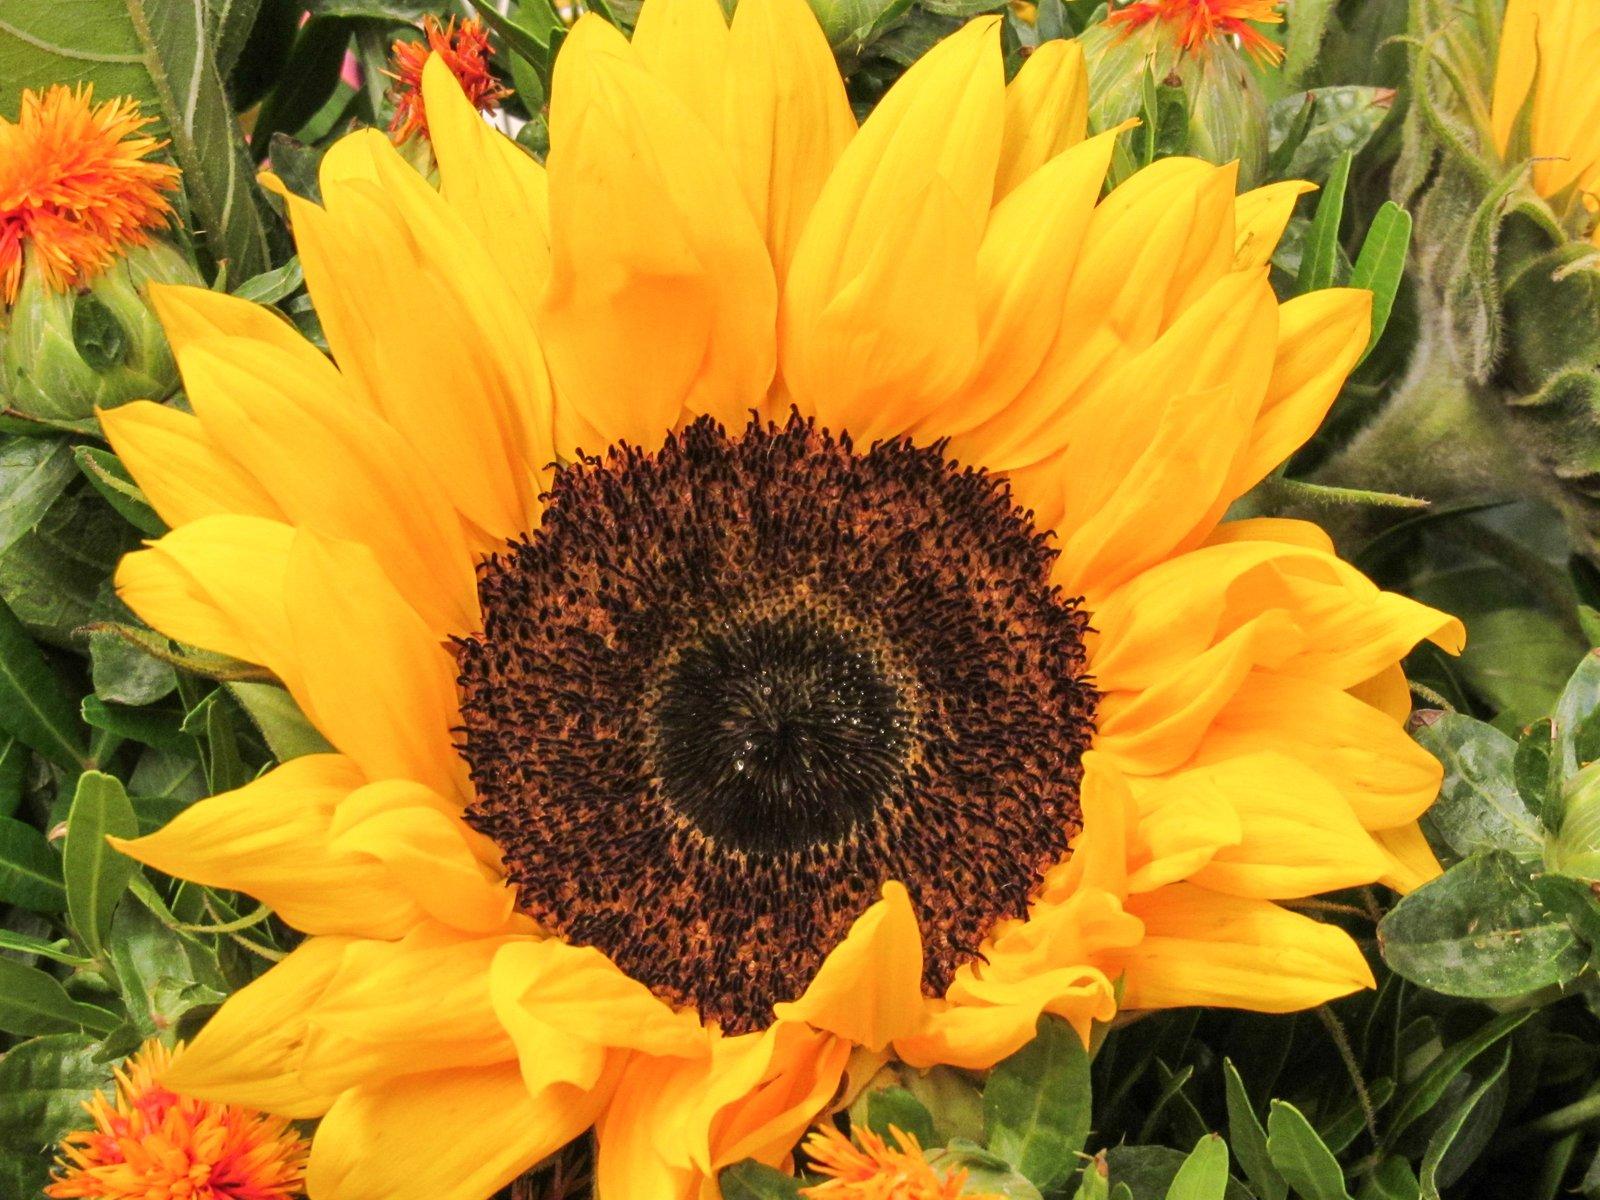 Free sunflower bouquet 3 Stock Photo - FreeImages.com